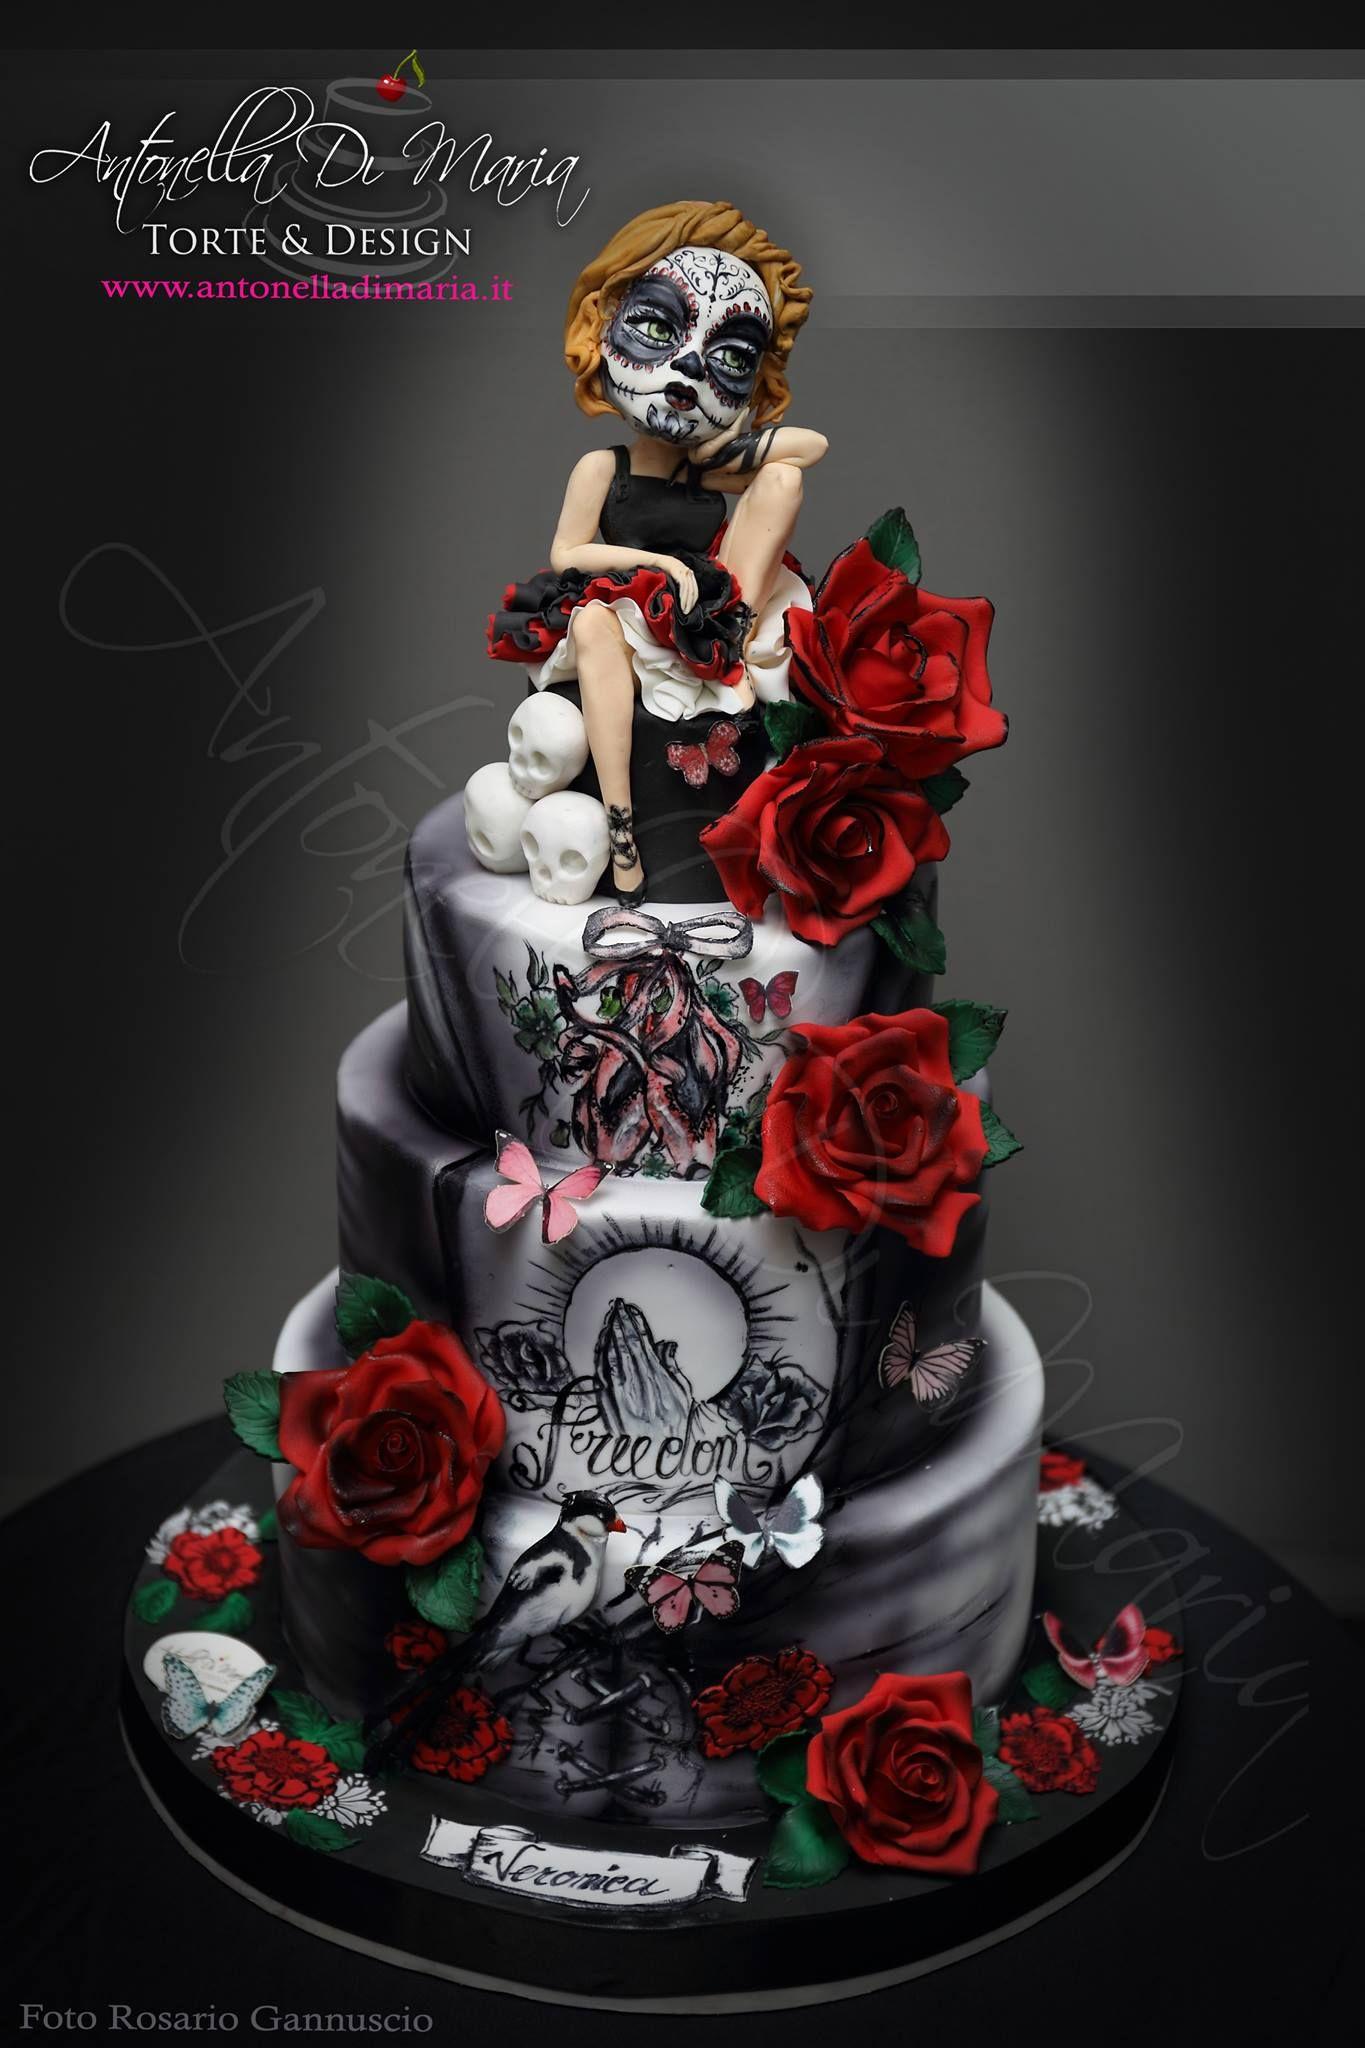 Wondrous Pin By Deborah Beard On Birthday Cake Ideas Bling Wedding Cakes Funny Birthday Cards Online Barepcheapnameinfo